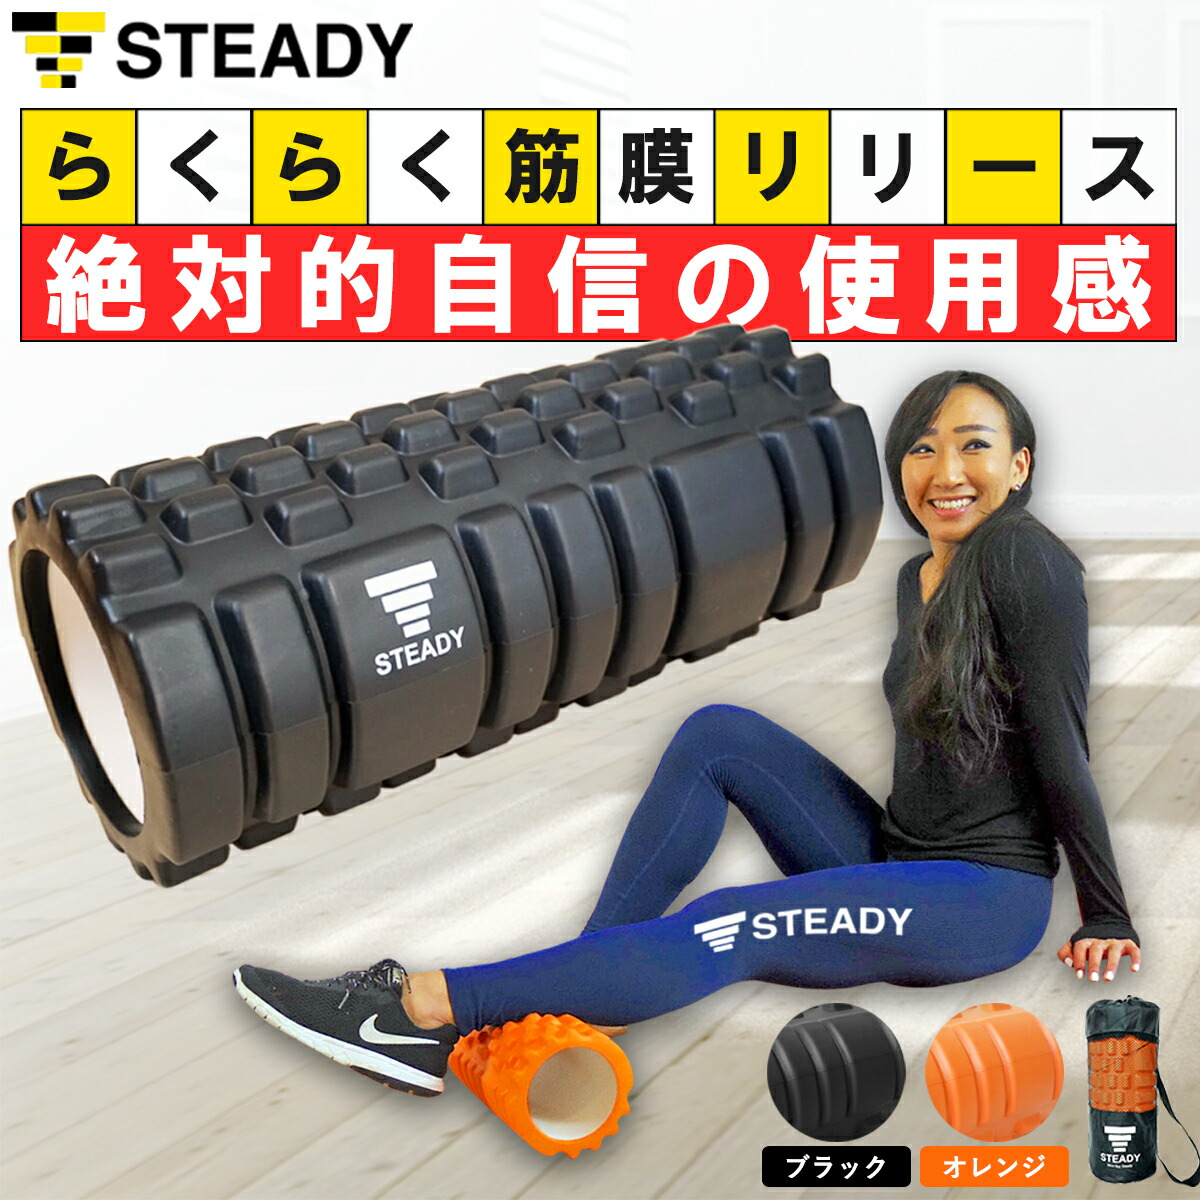 steadyフォームローラー